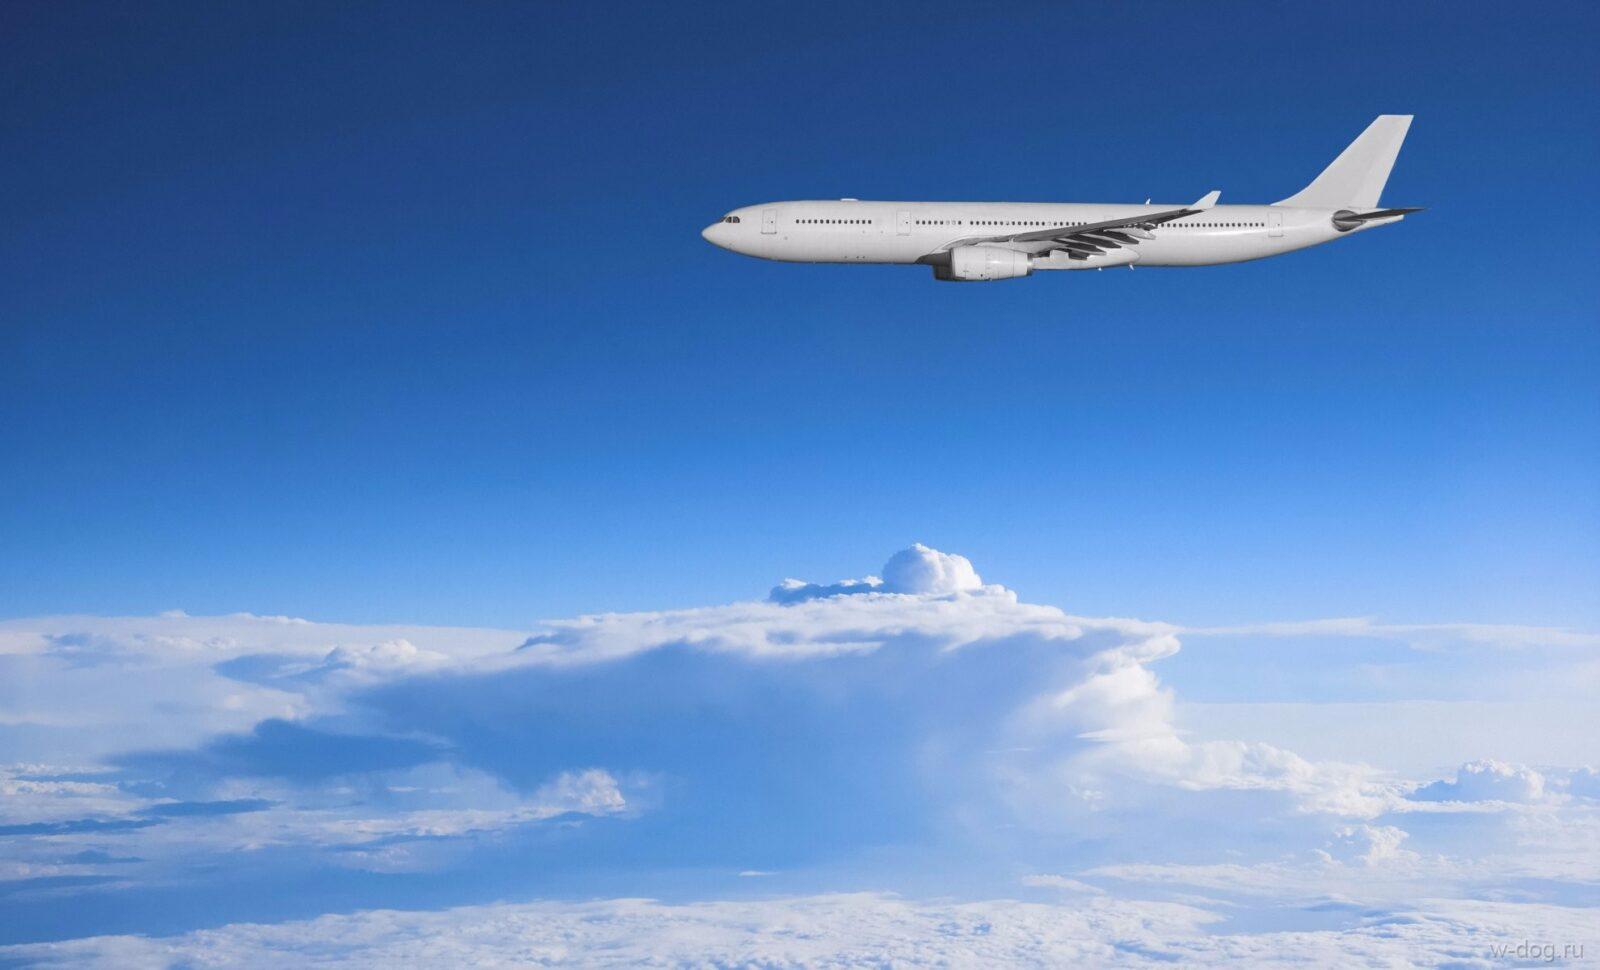 Пассажиры будут находиться как будто среди облаков! Создан самолёт без окон